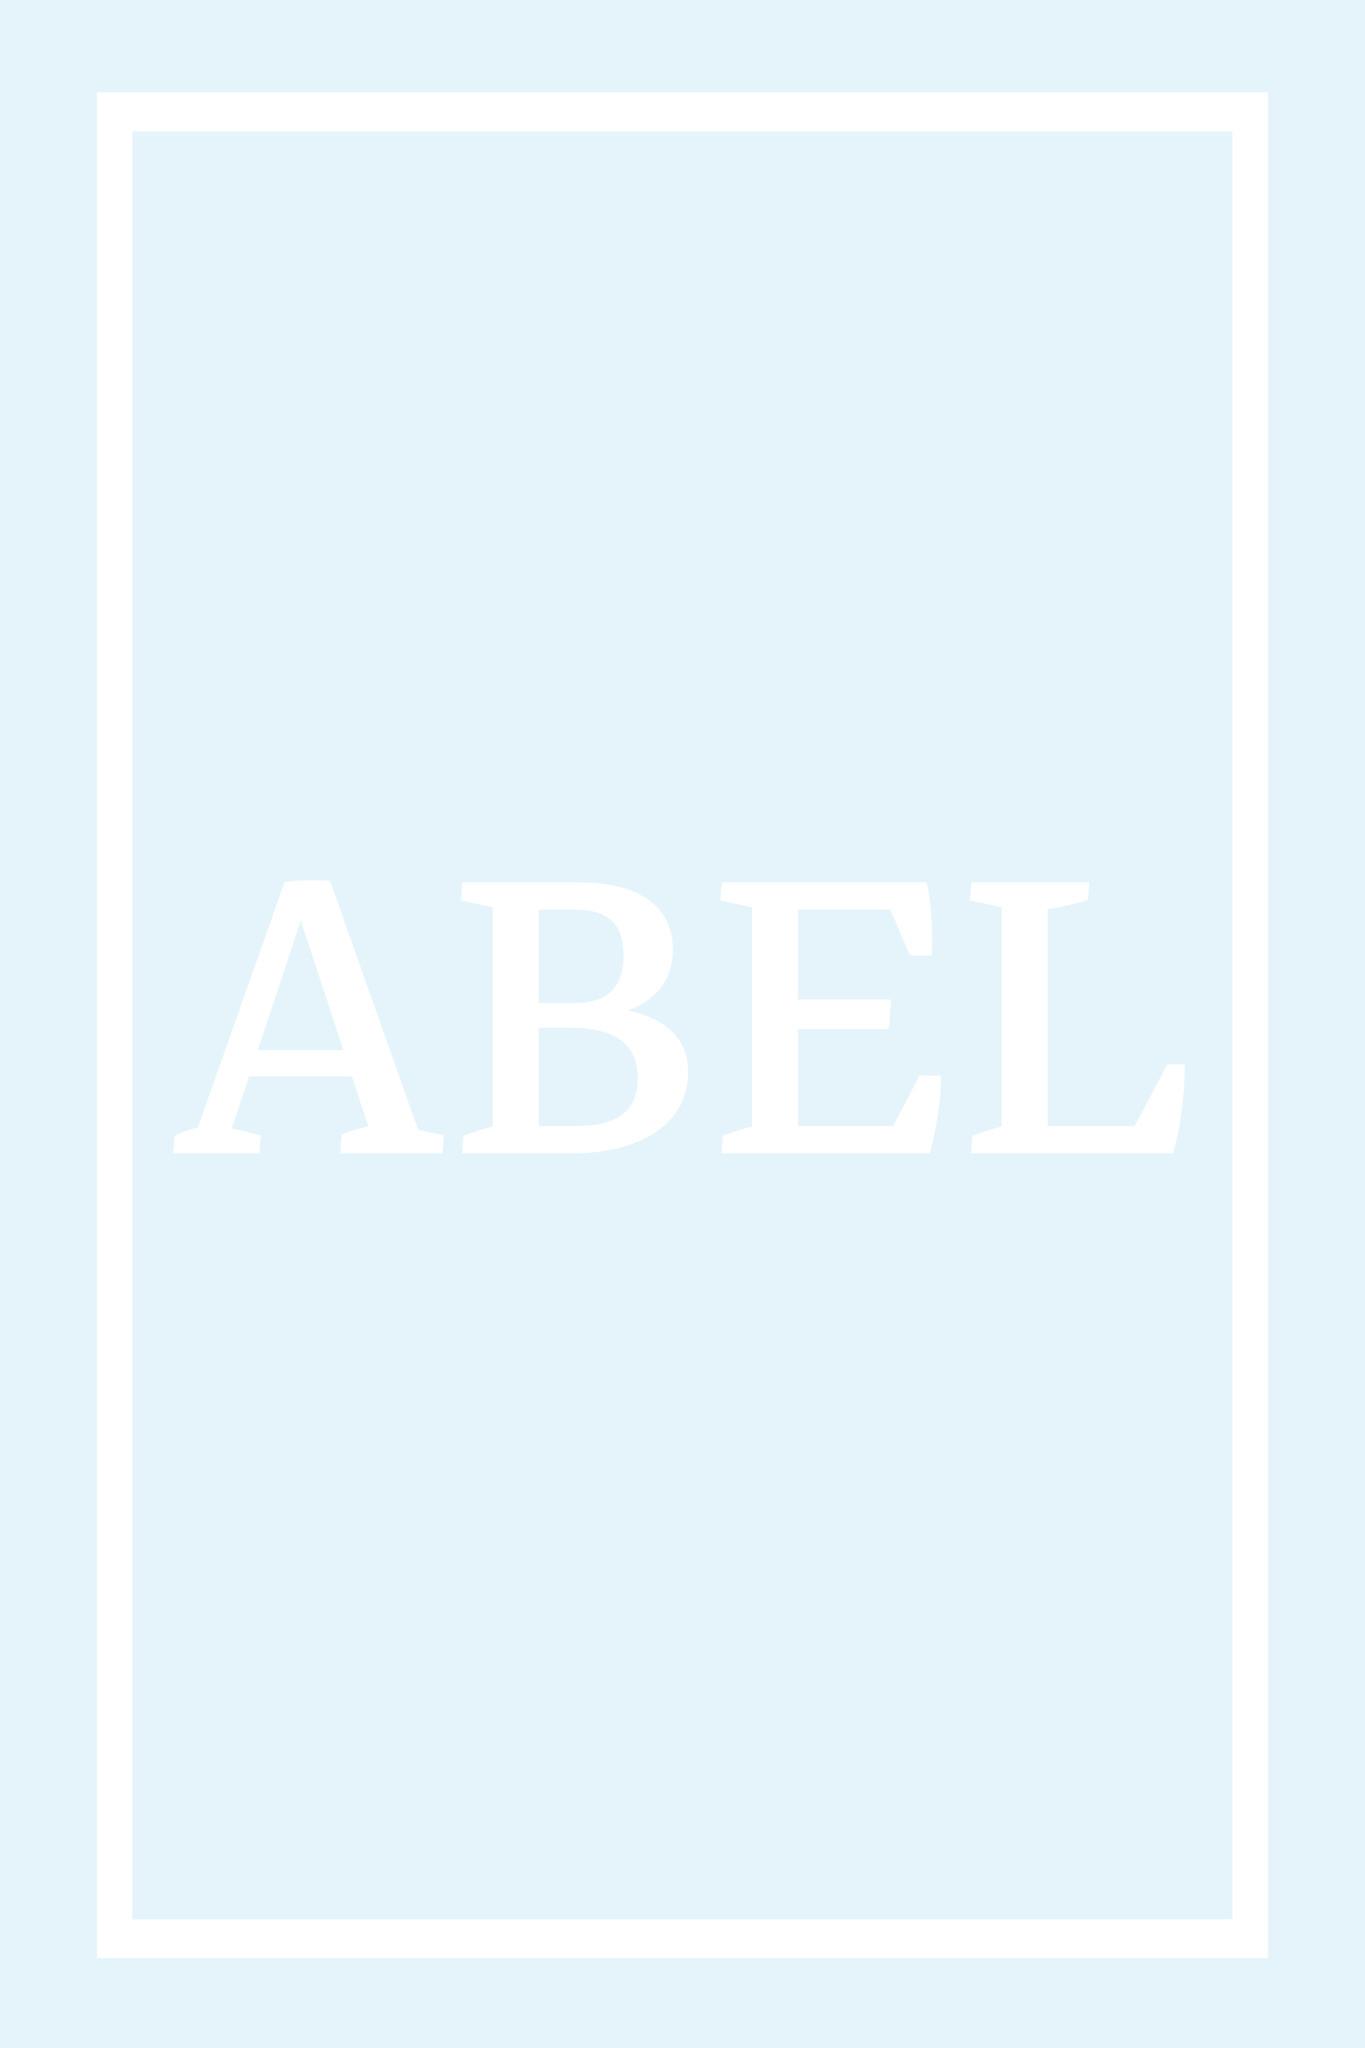 Play Carpet // Blue White - Full Name Horizontal